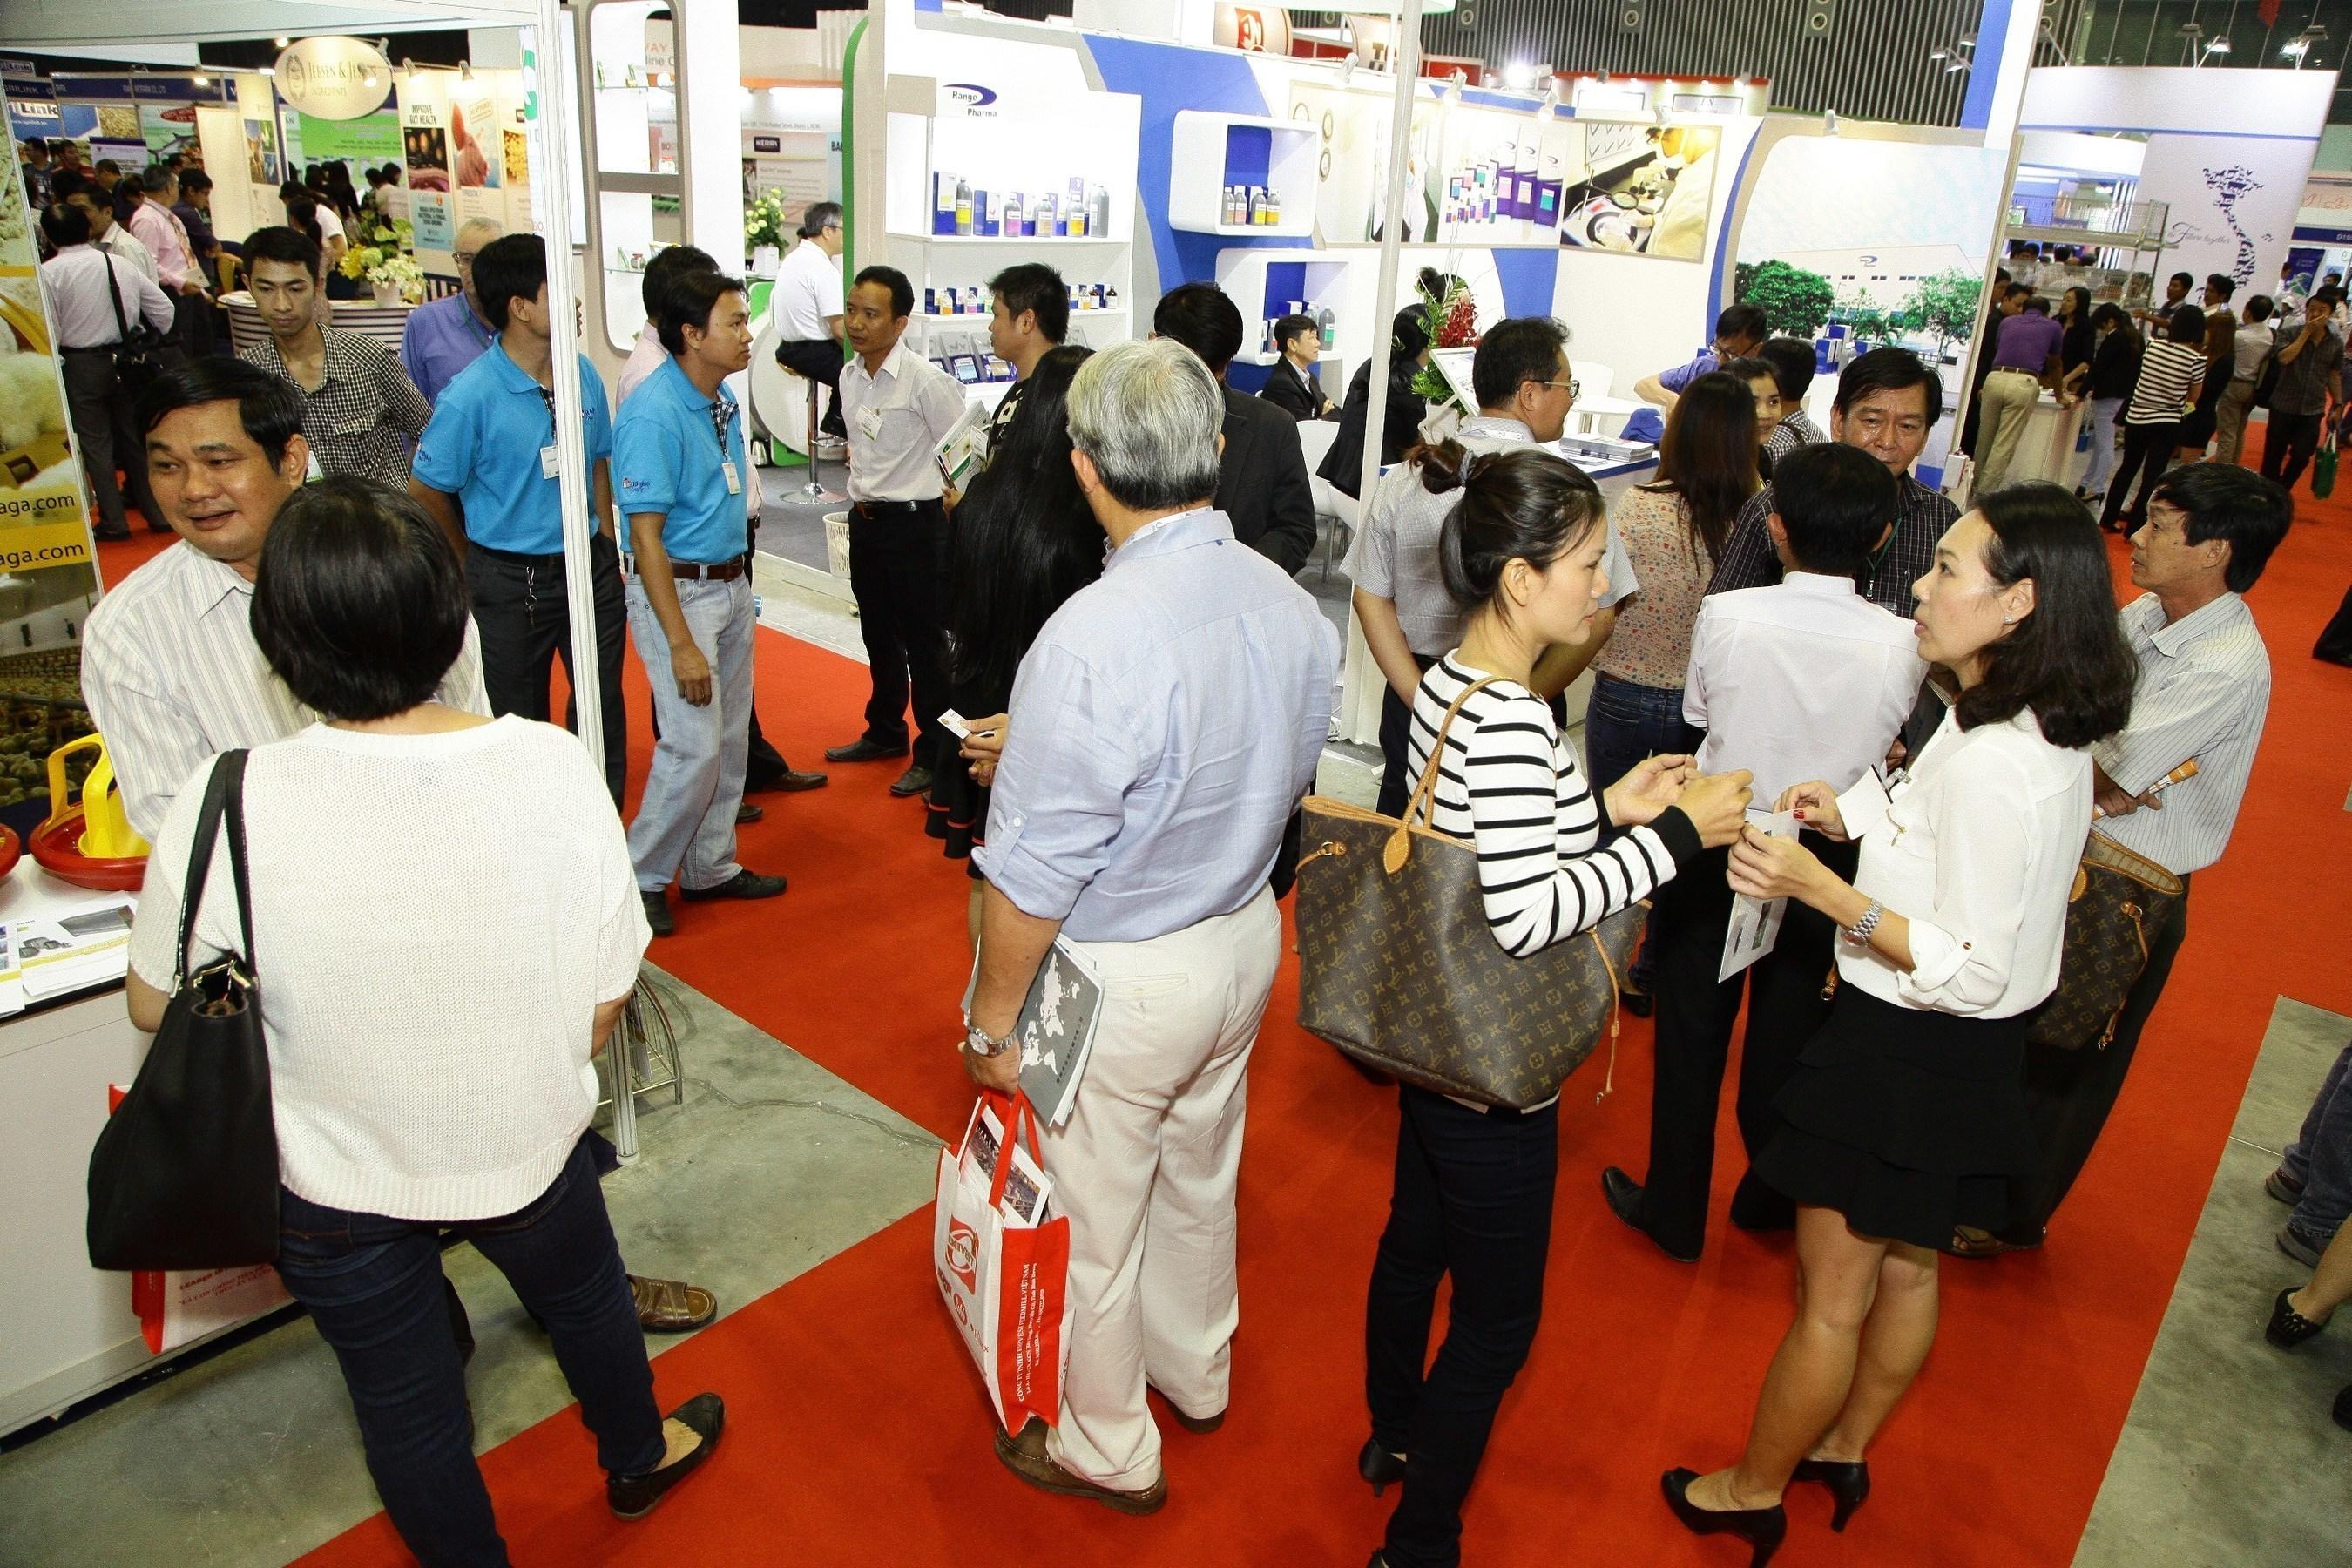 VIETSTOCK Expo & Forum, version 2014